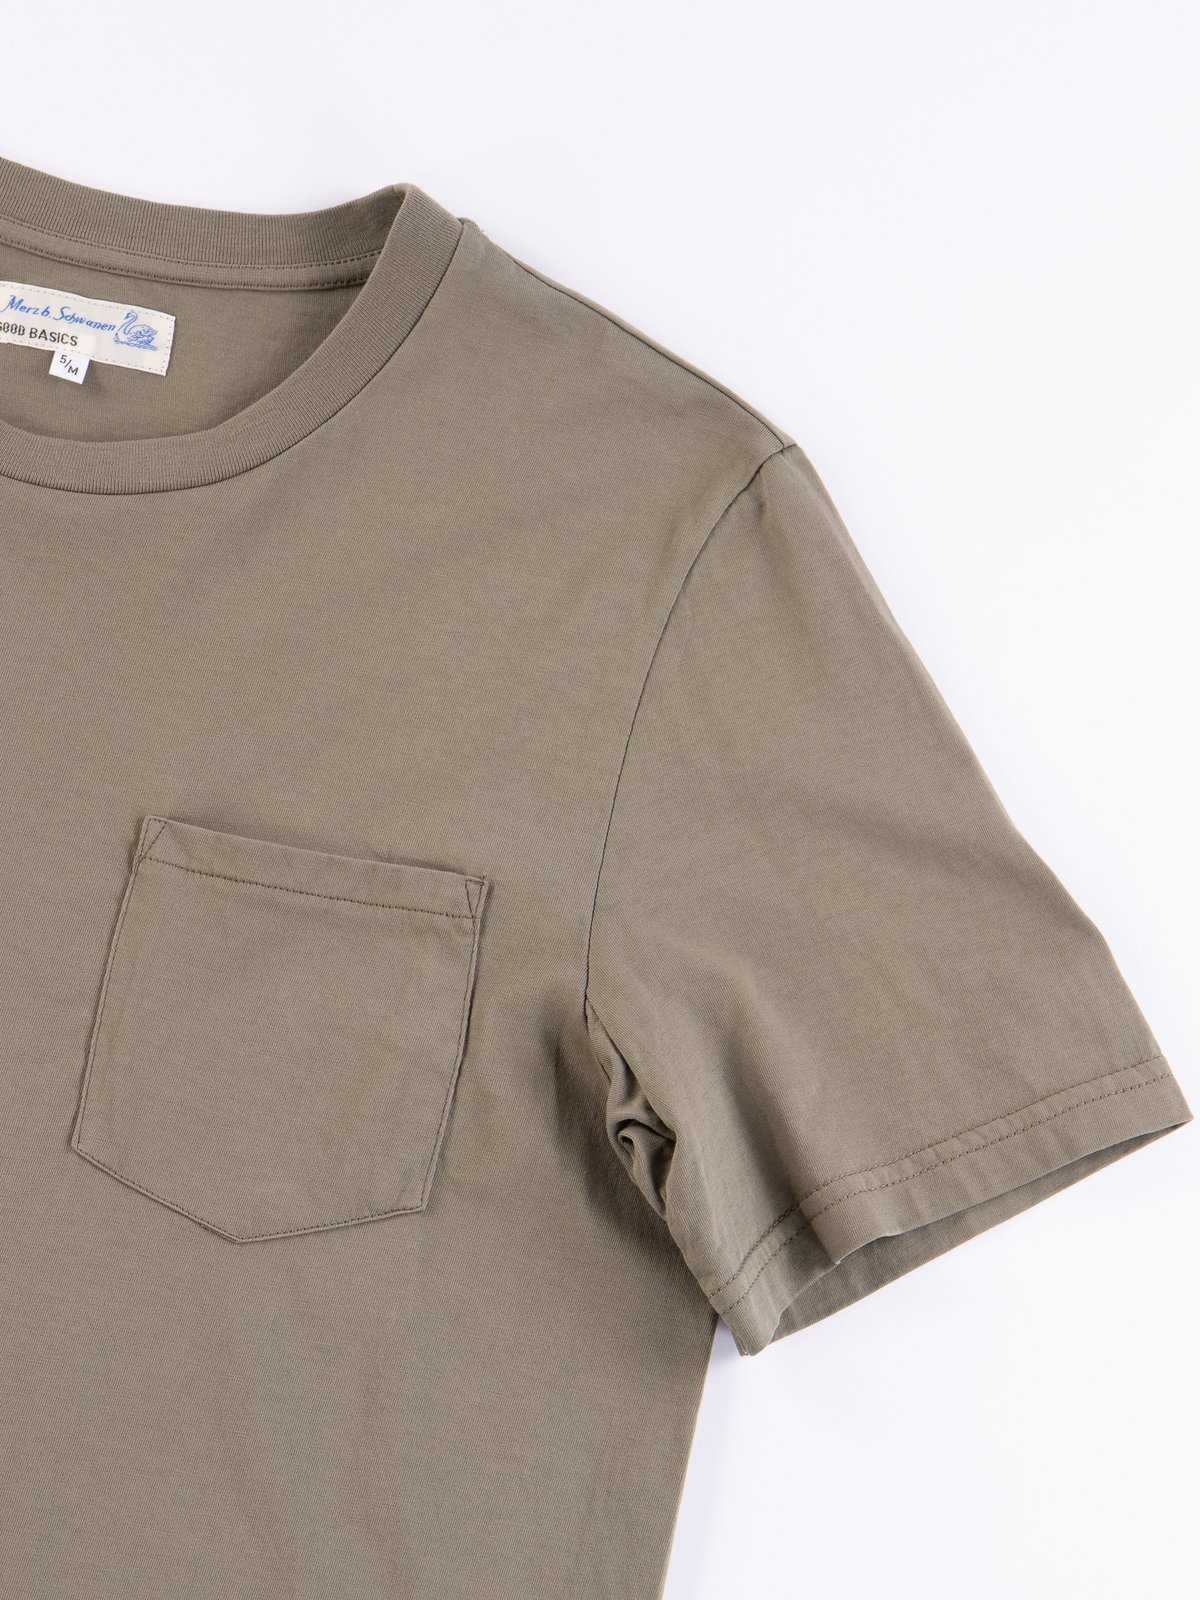 Army Good Basics CTP01 Pocket Crew Neck Tee - Image 4